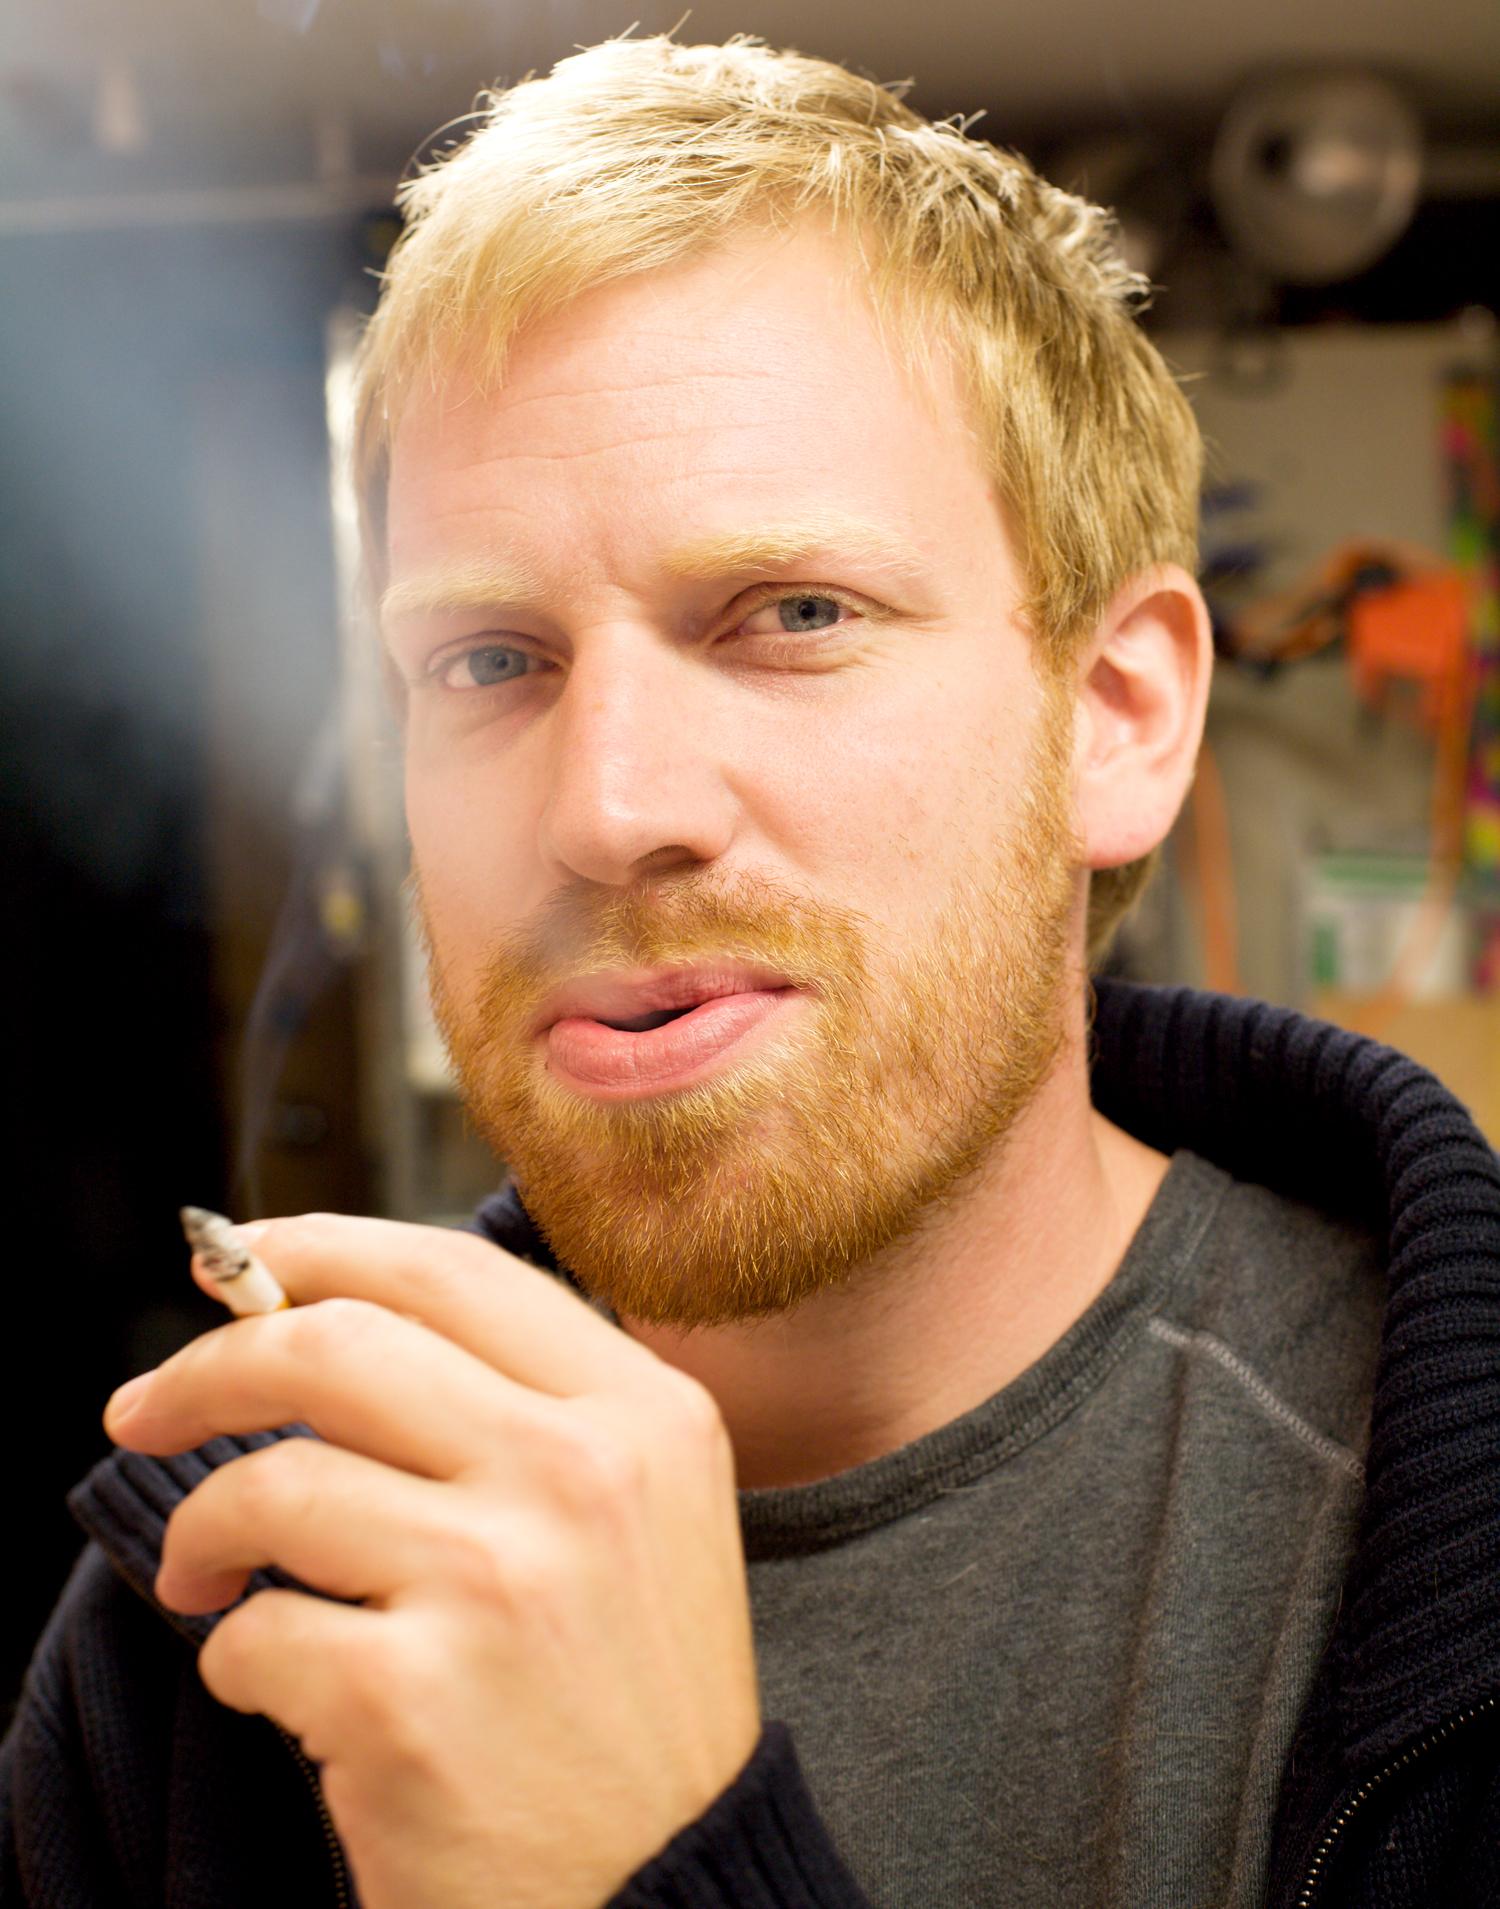 Jonn Angelbeck, painter